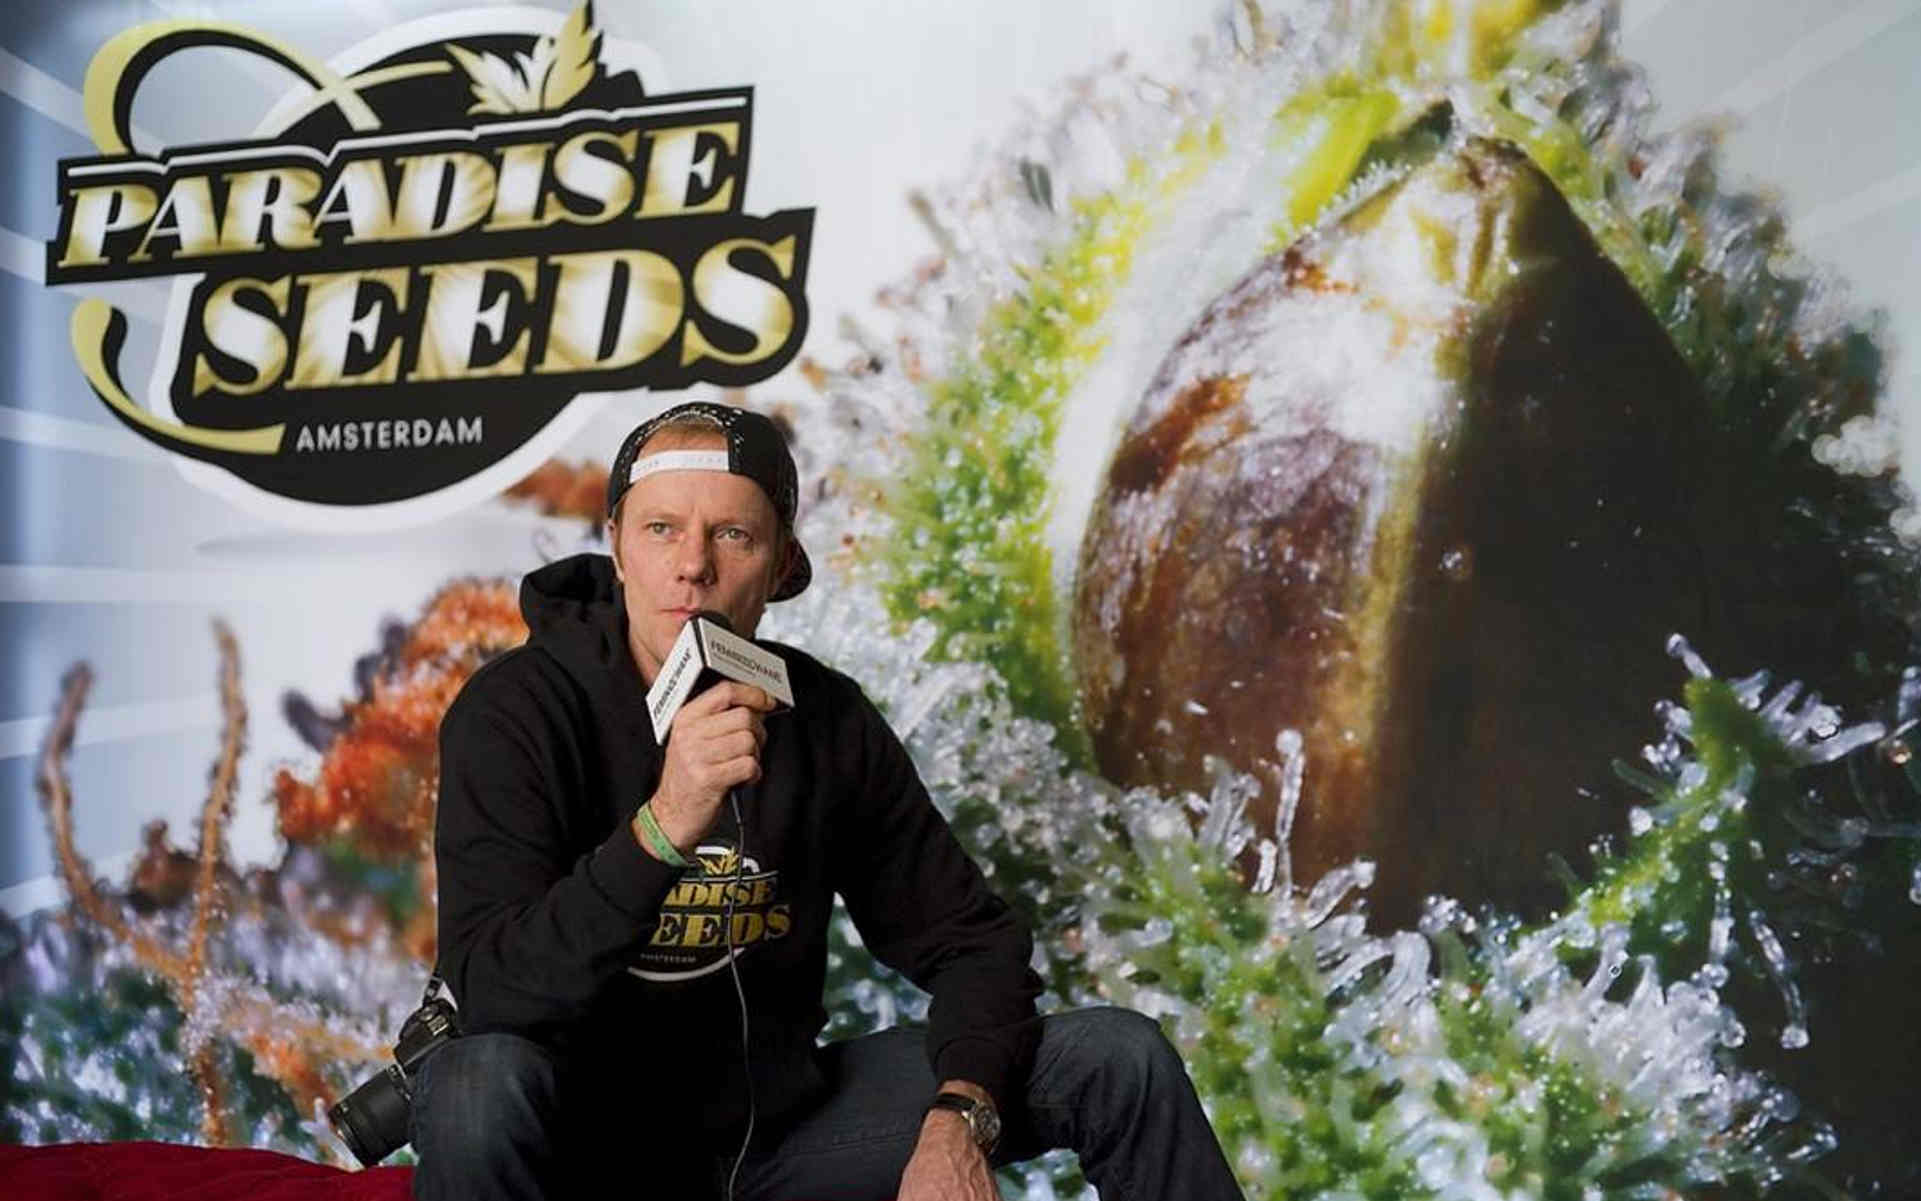 Paradise Seeds – holenderski bank nasion z tradycjami